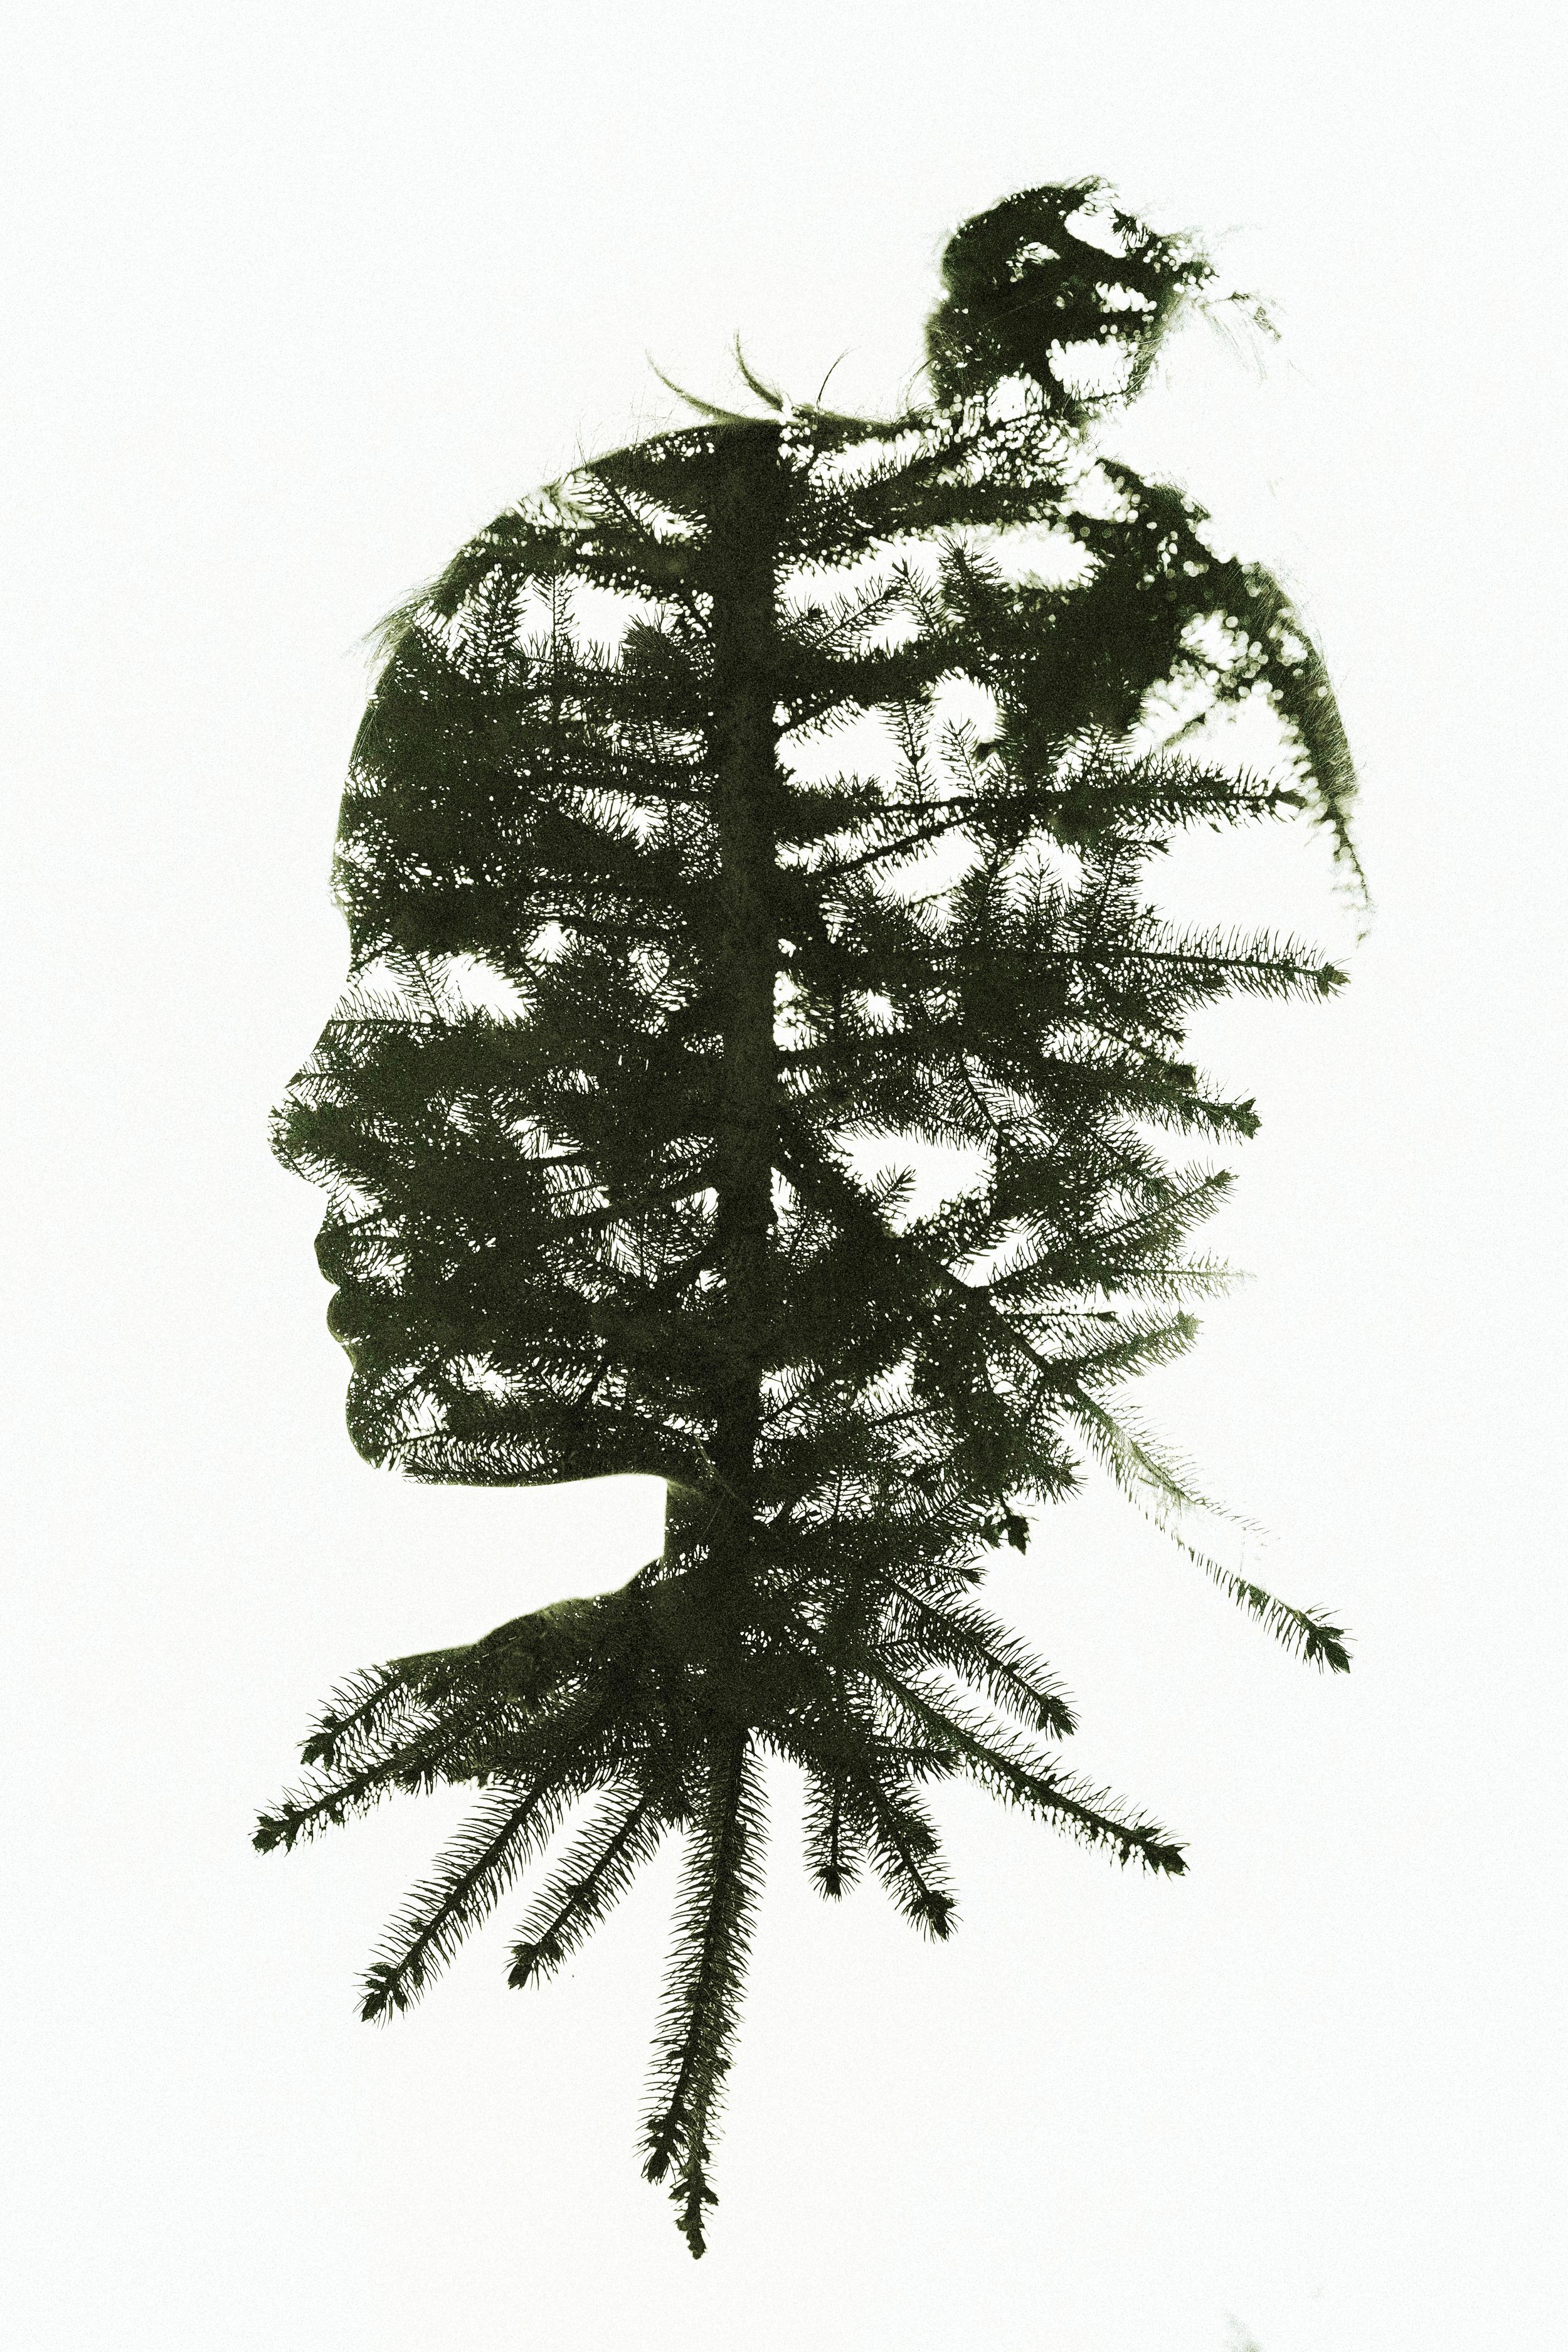 Hello-olivia-photography-long-island-family-children-childrens-photographer-double-exposure-pine-tree-profile